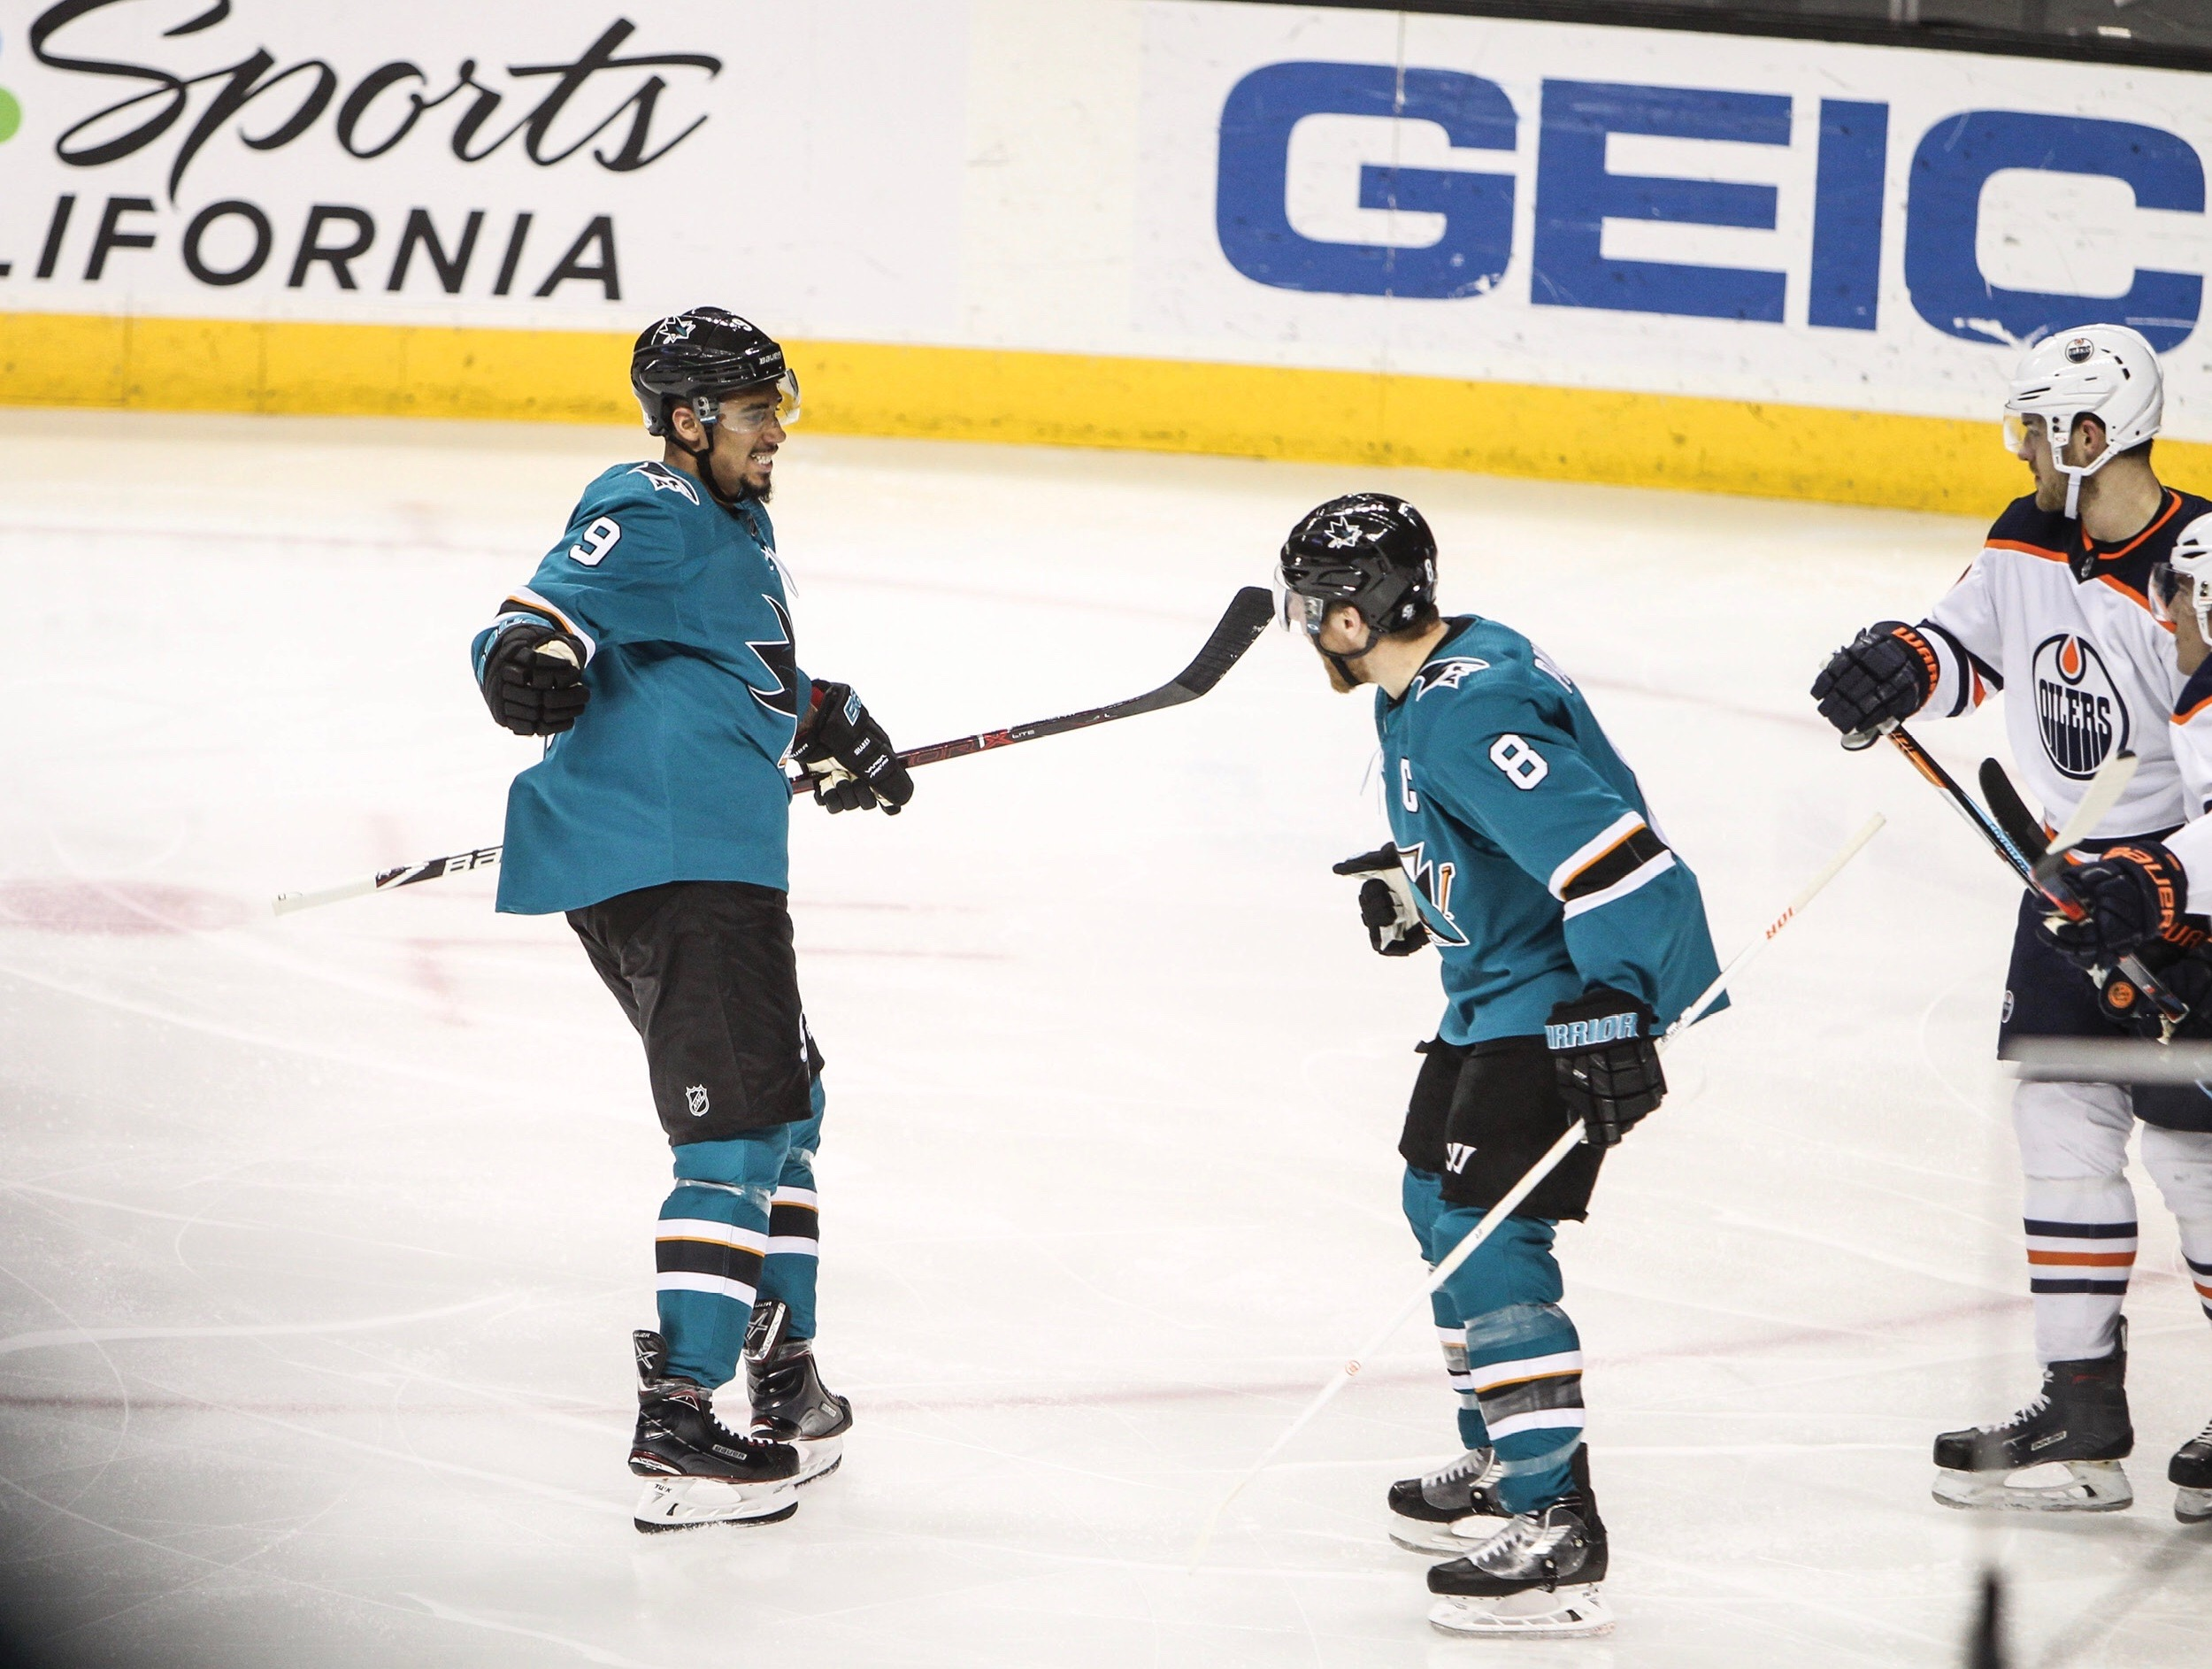 Kane, Pavelski score twice in 8-2 win over Flyers – The Spear